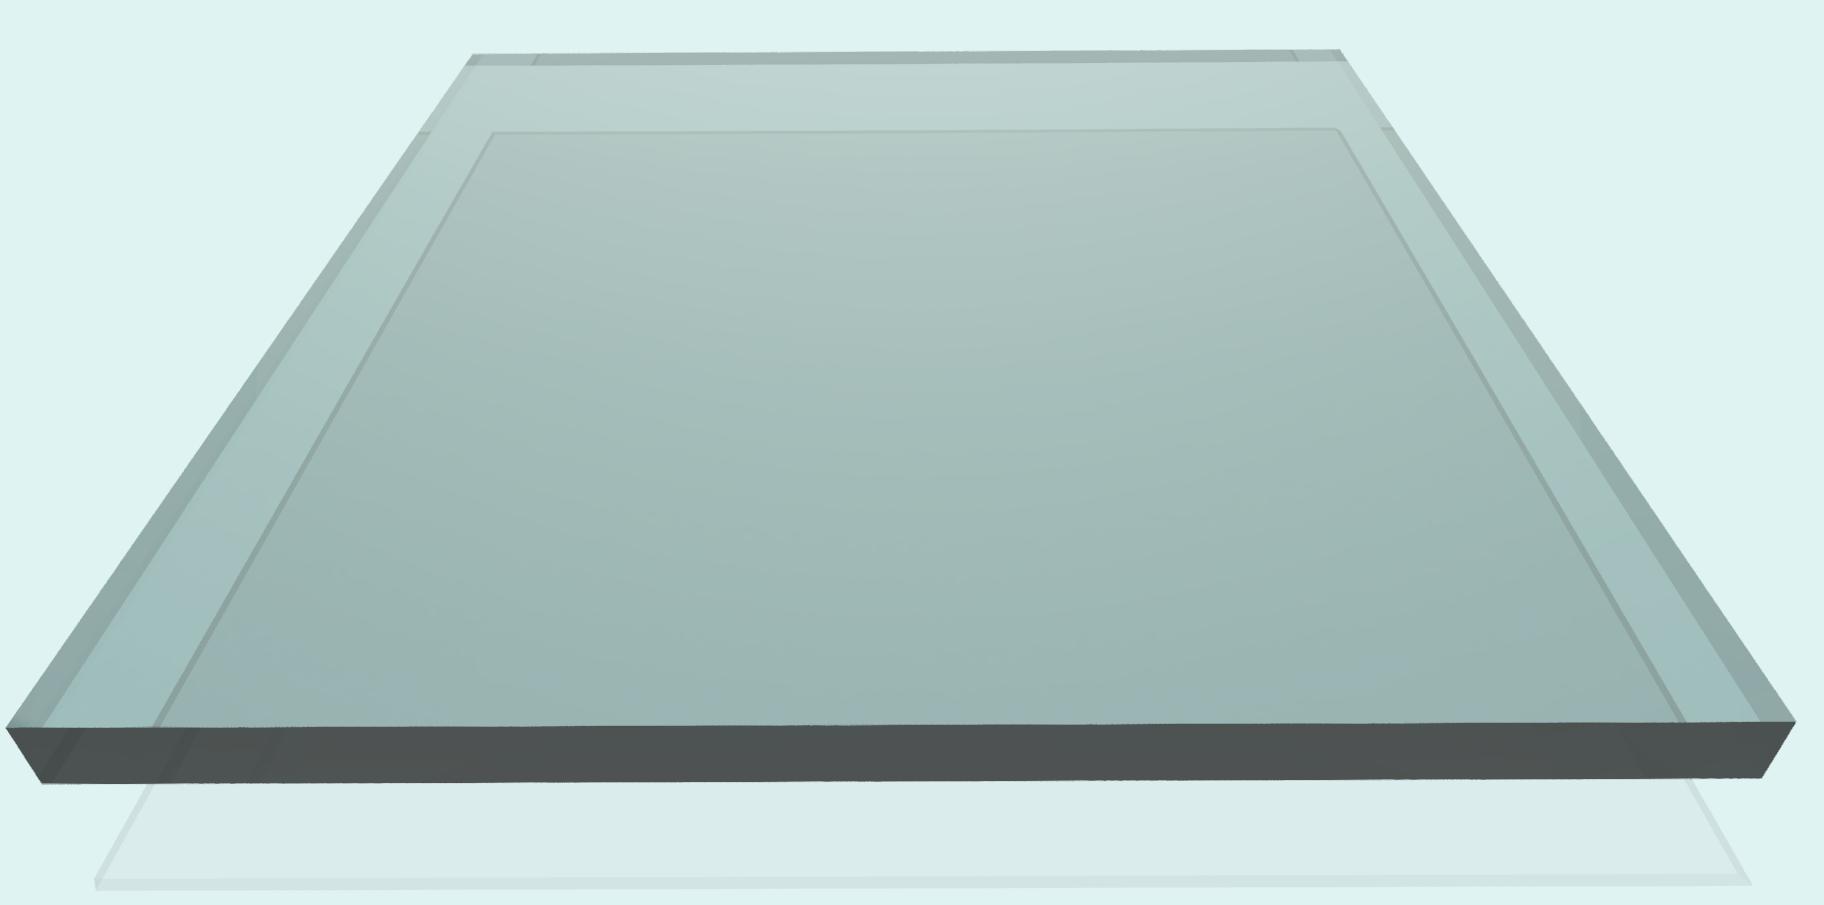 Polycarbonat 10 mm, klar